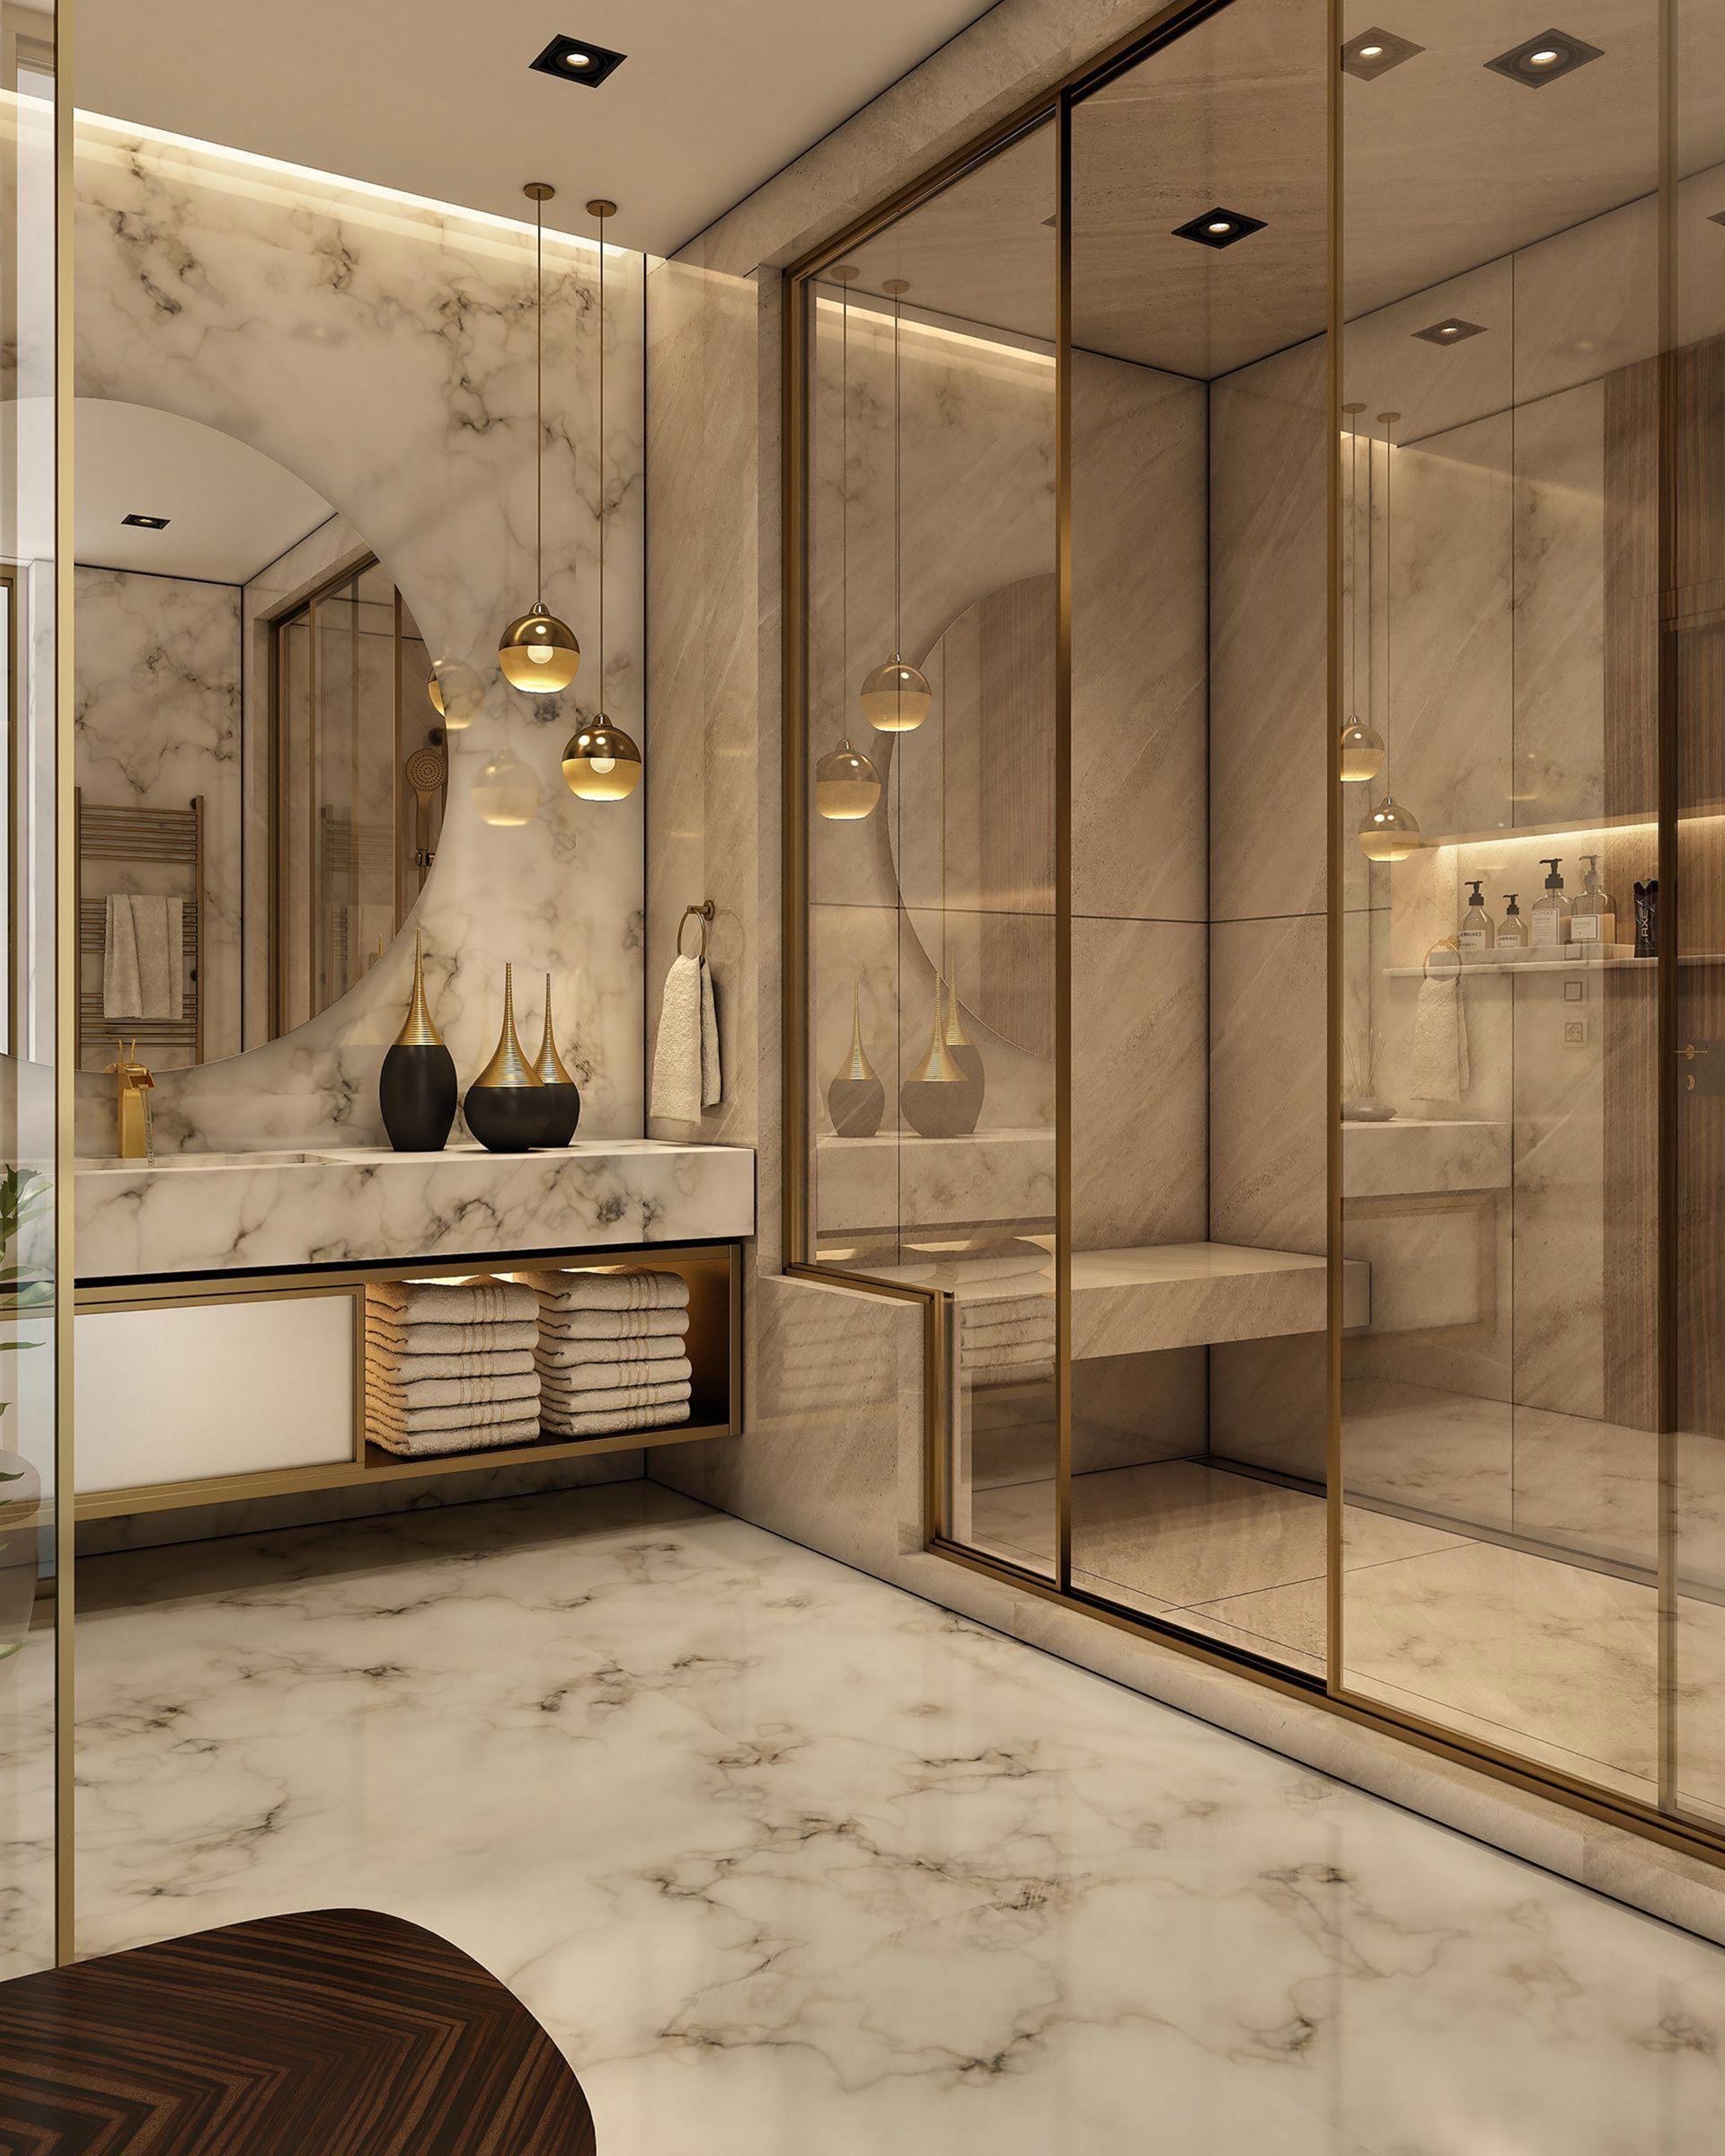 Enchanting Luxurious Bathroom Decorating Ideas 033